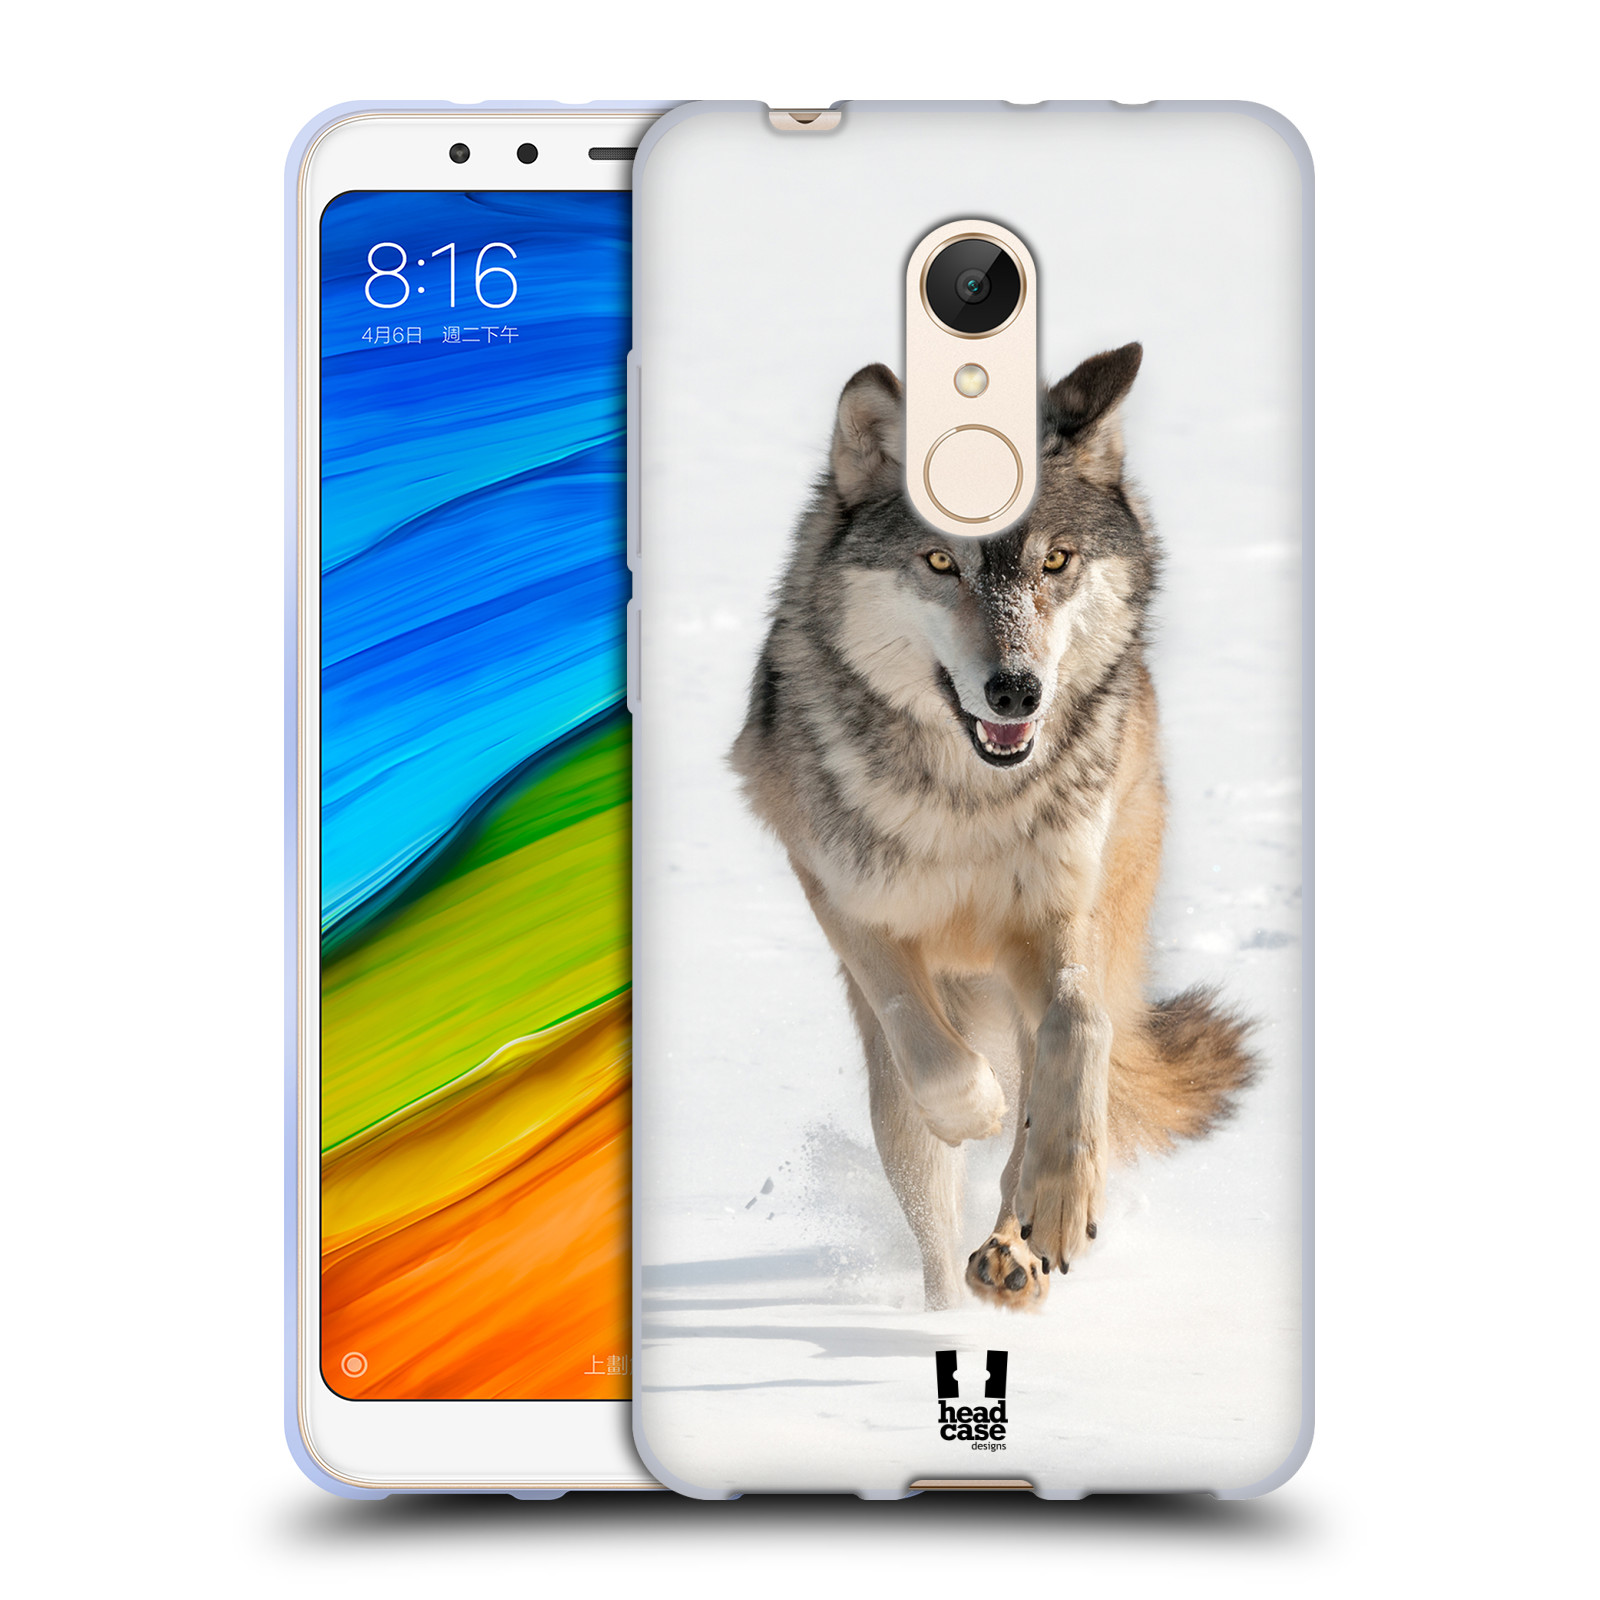 Silikonové pouzdro na mobil Xiaomi Redmi 5 - Head Case - DIVOČINA – VLK (Silikonový kryt či obal na mobilní telefon Xiaomi Redmi 5 s motivem DIVOČINA – VLK)